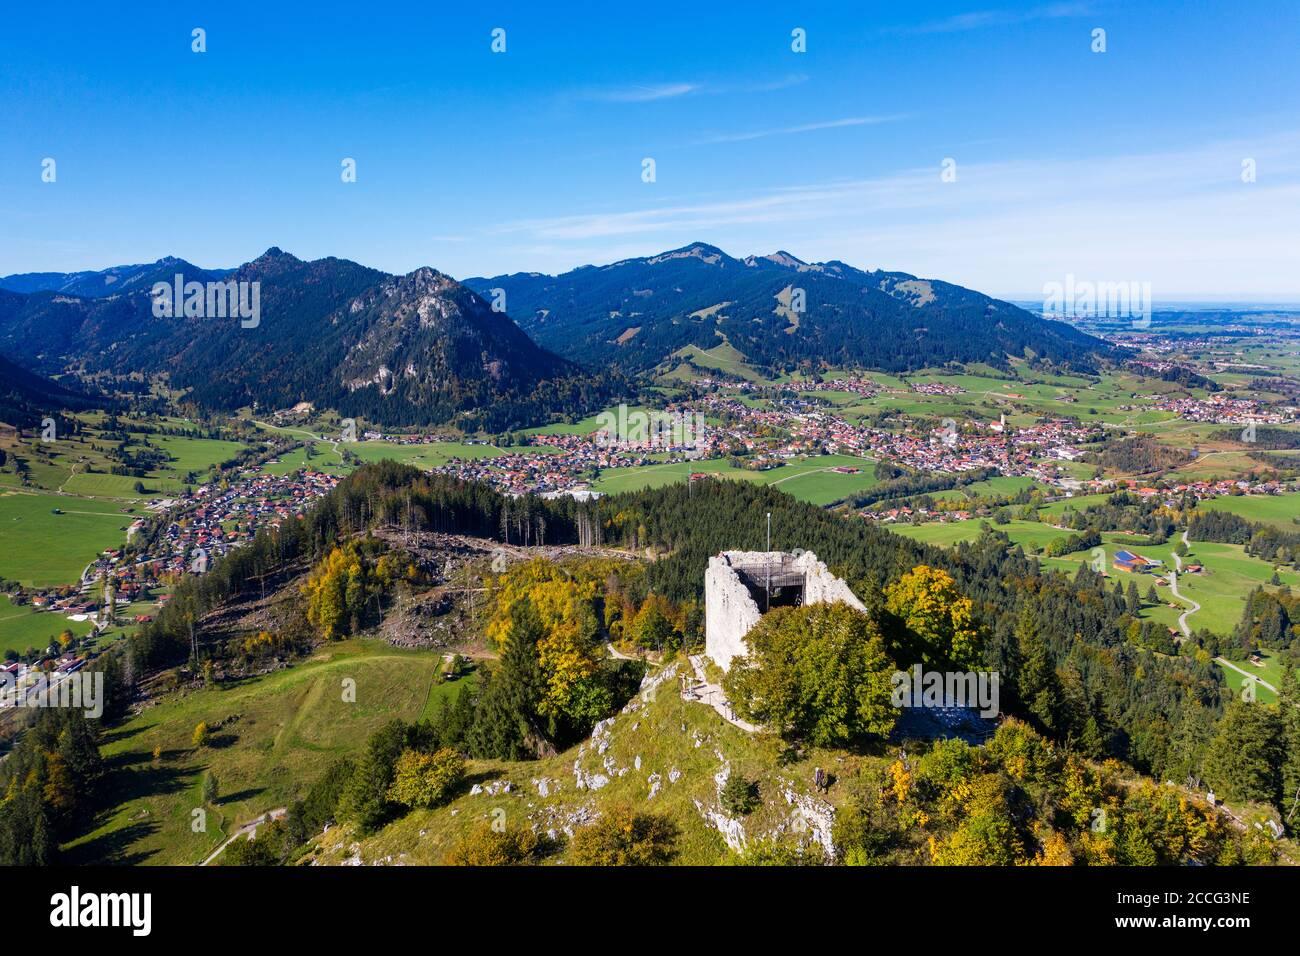 Rovine del castello di Falkenstein, Pfronten, Ostallgäu, Allgäu, vista aerea, Svevia, Baviera, Germania Foto Stock